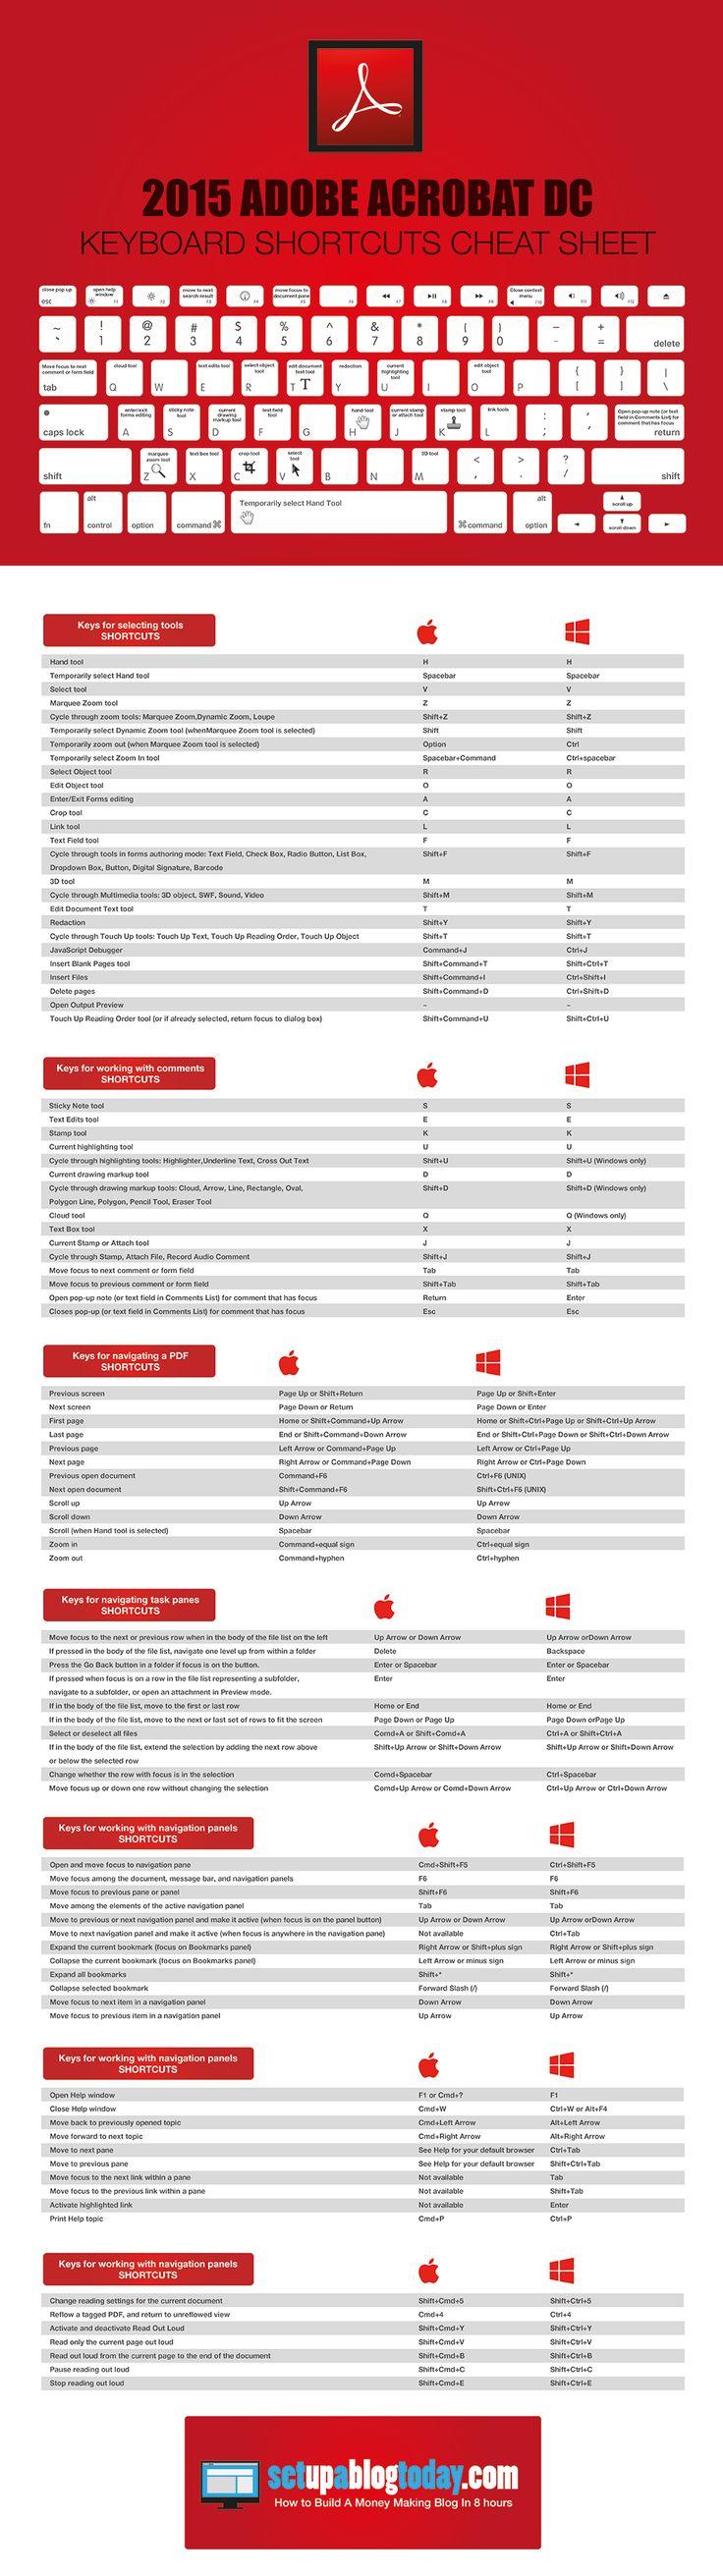 17 Best ideas about Adobe Acrobat on Pinterest | Adobe, Adobe ...